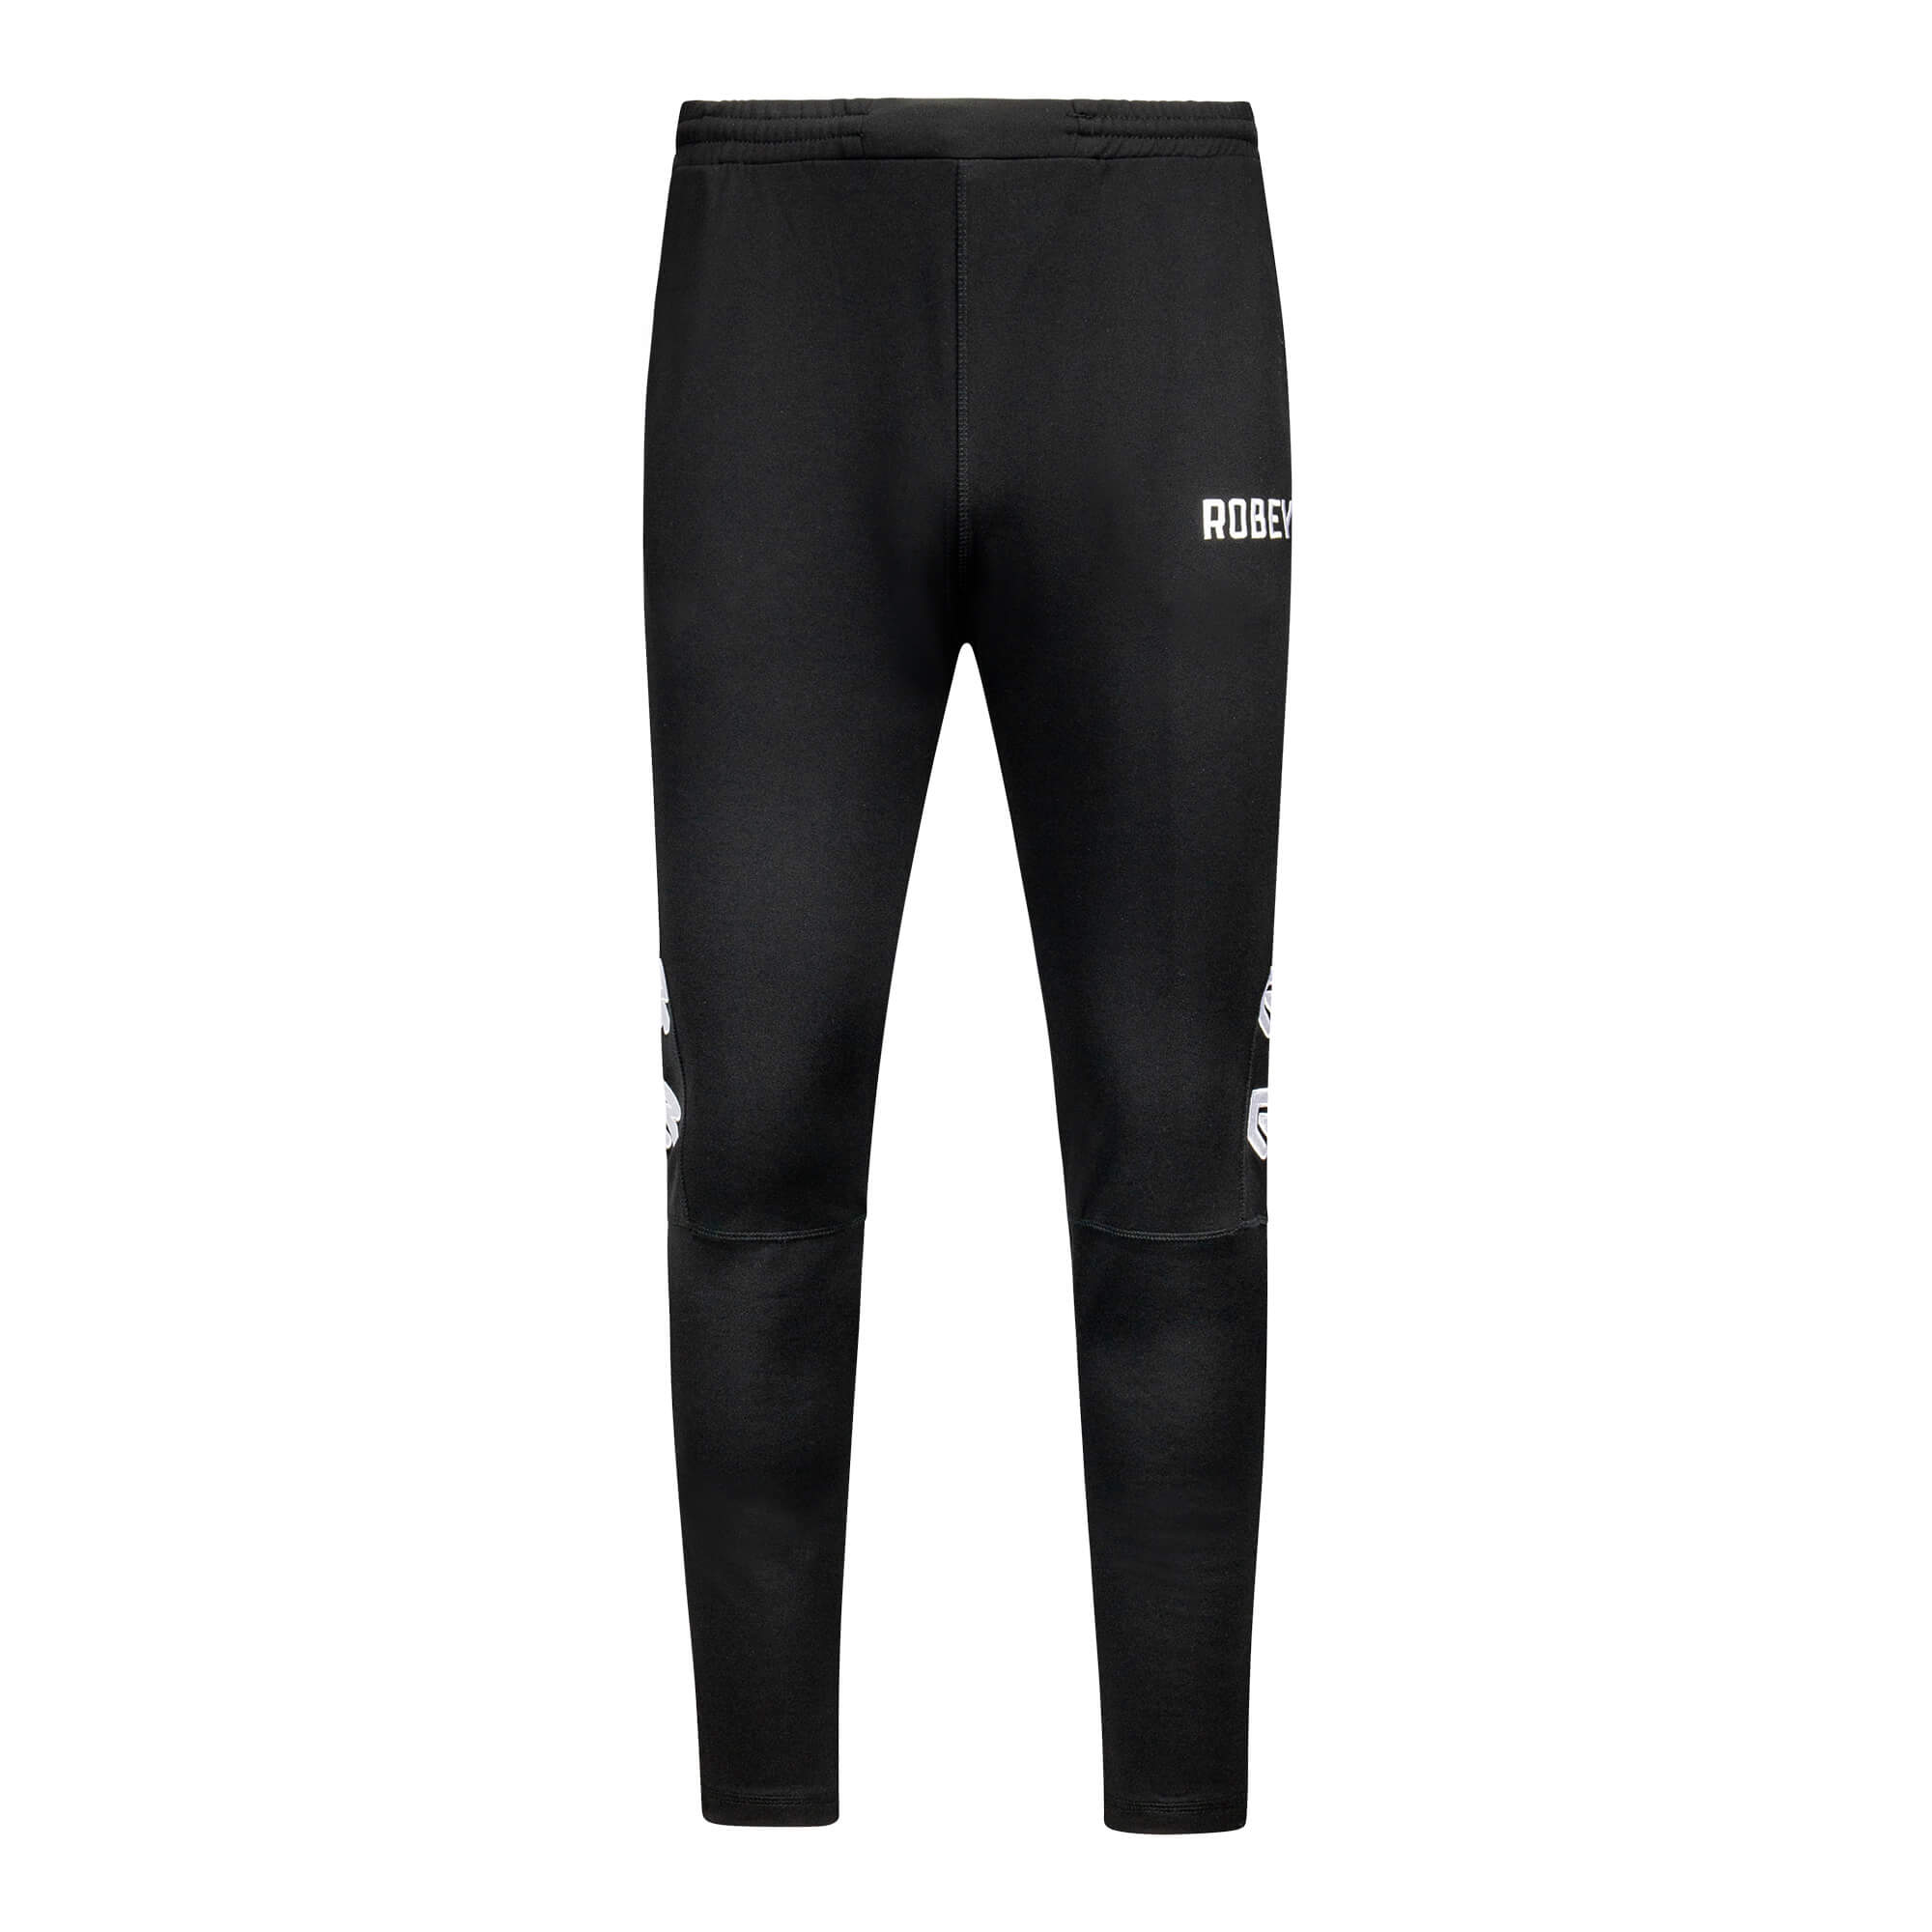 Robey Performance Pant - Black